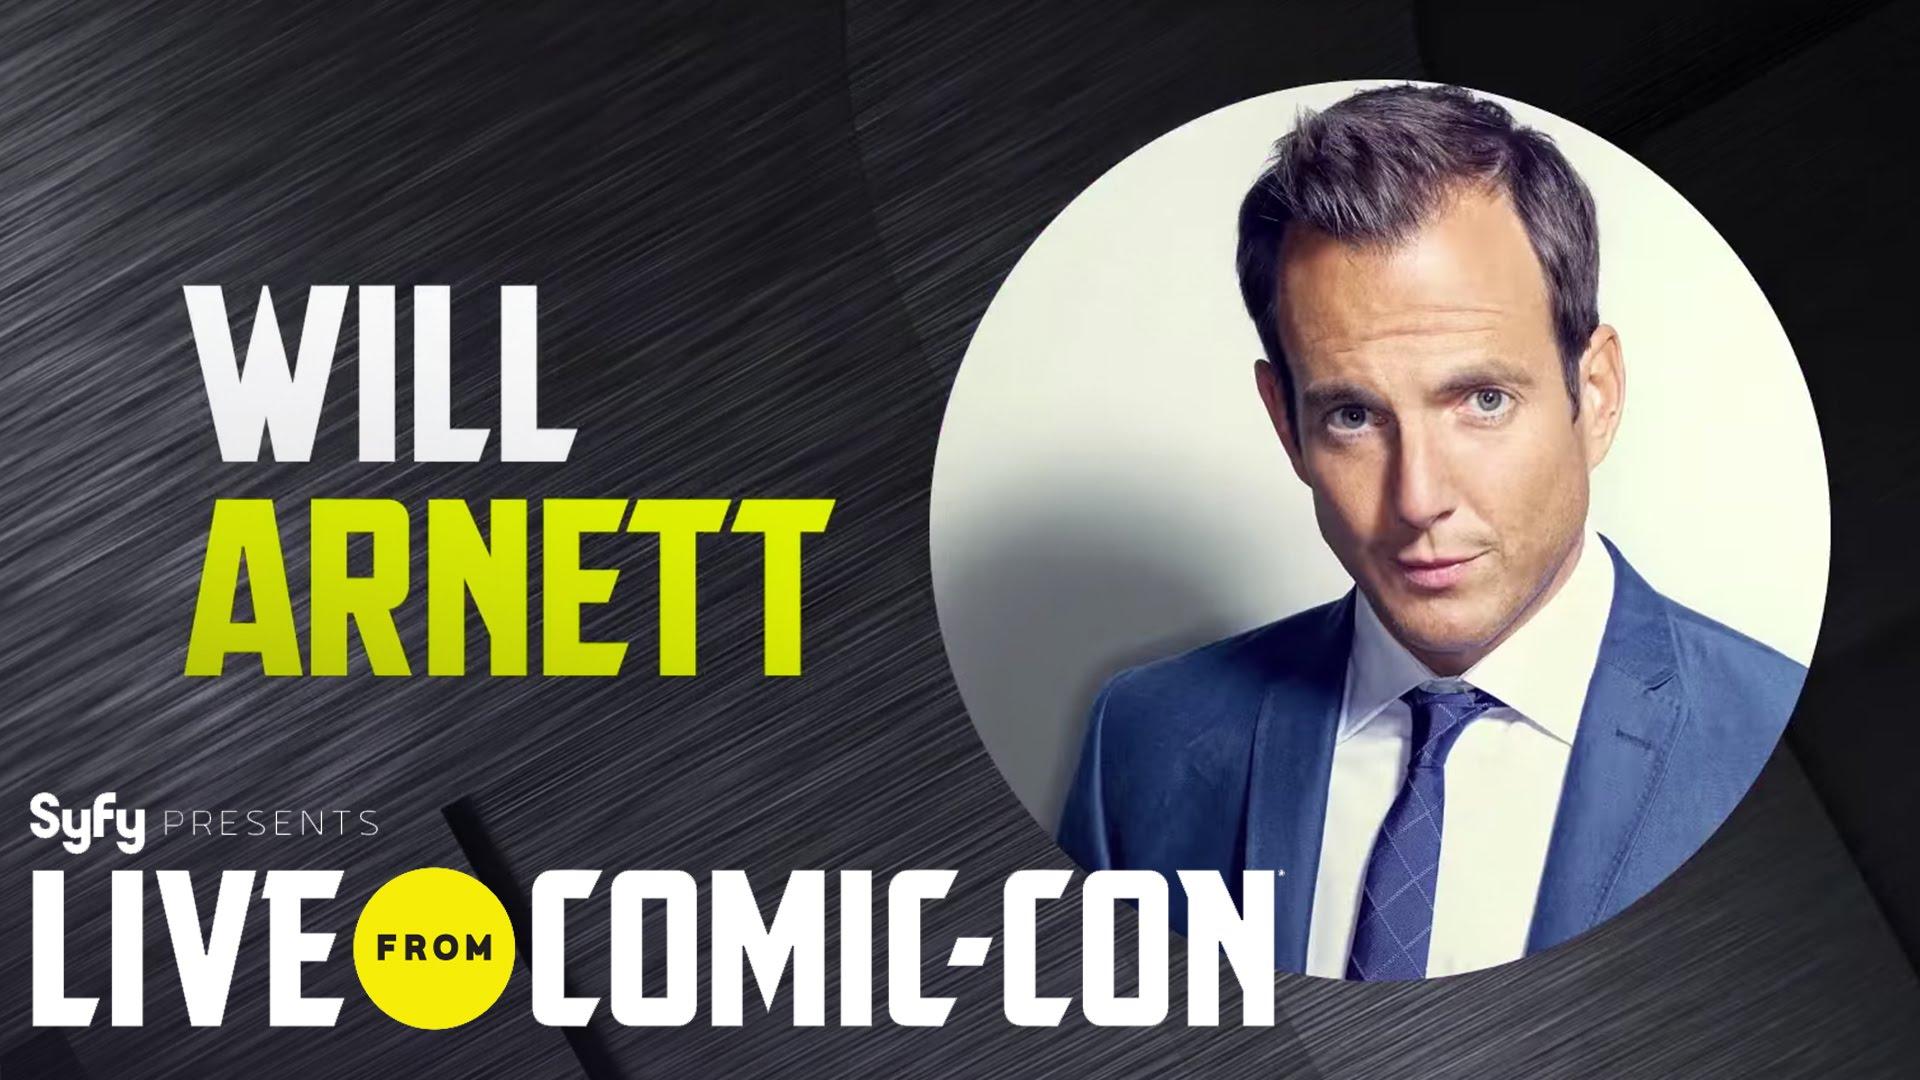 Syfy Presents Live from Comic Con (TV Series 2016– ) - IMDb